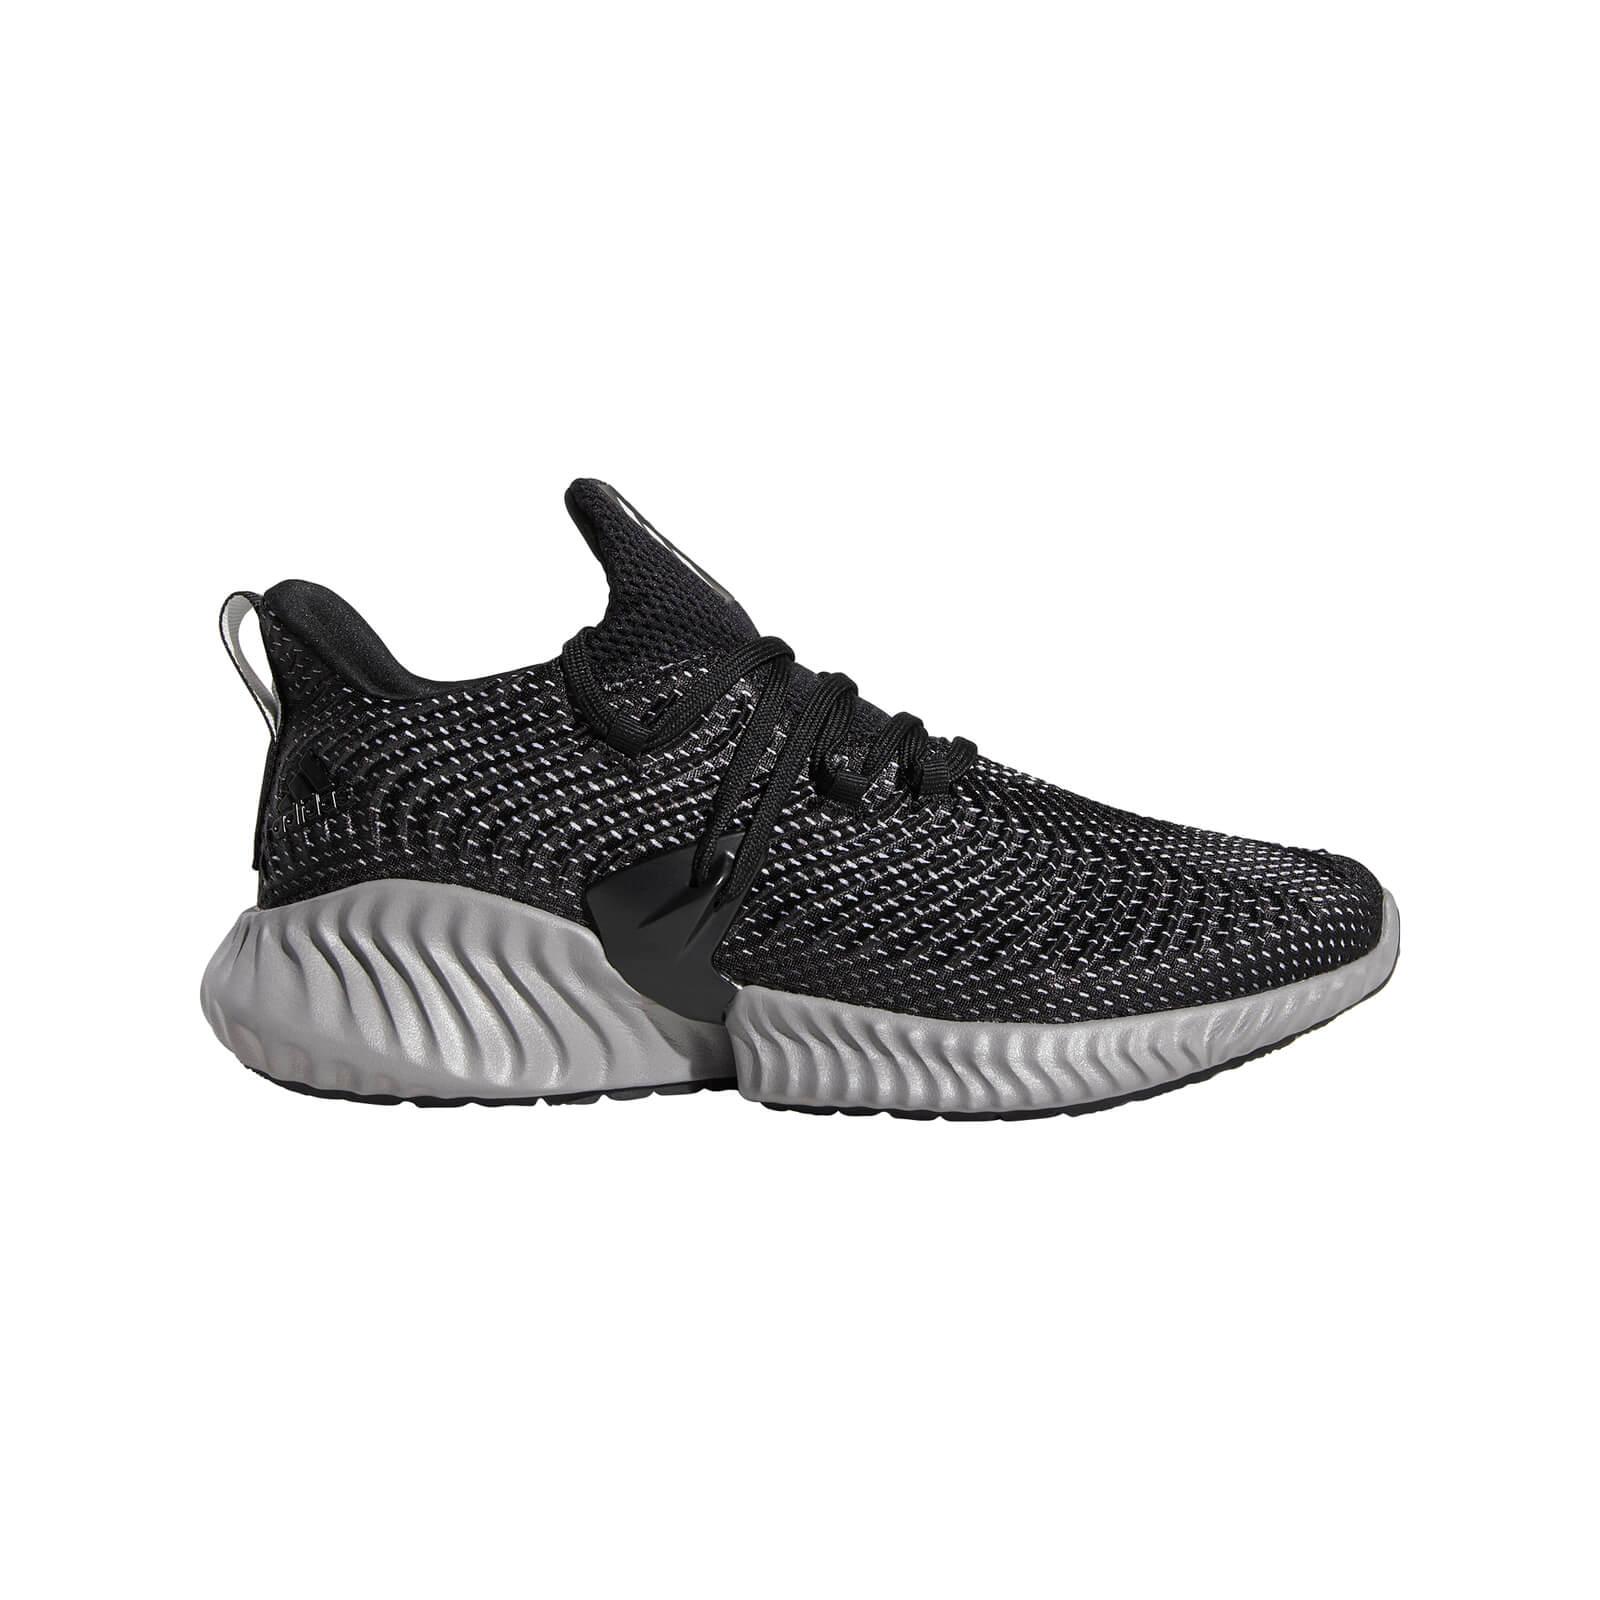 adidas Men's Alphabounce Instinct Running Shoes - Black - US 9/UK 8.5 - Black